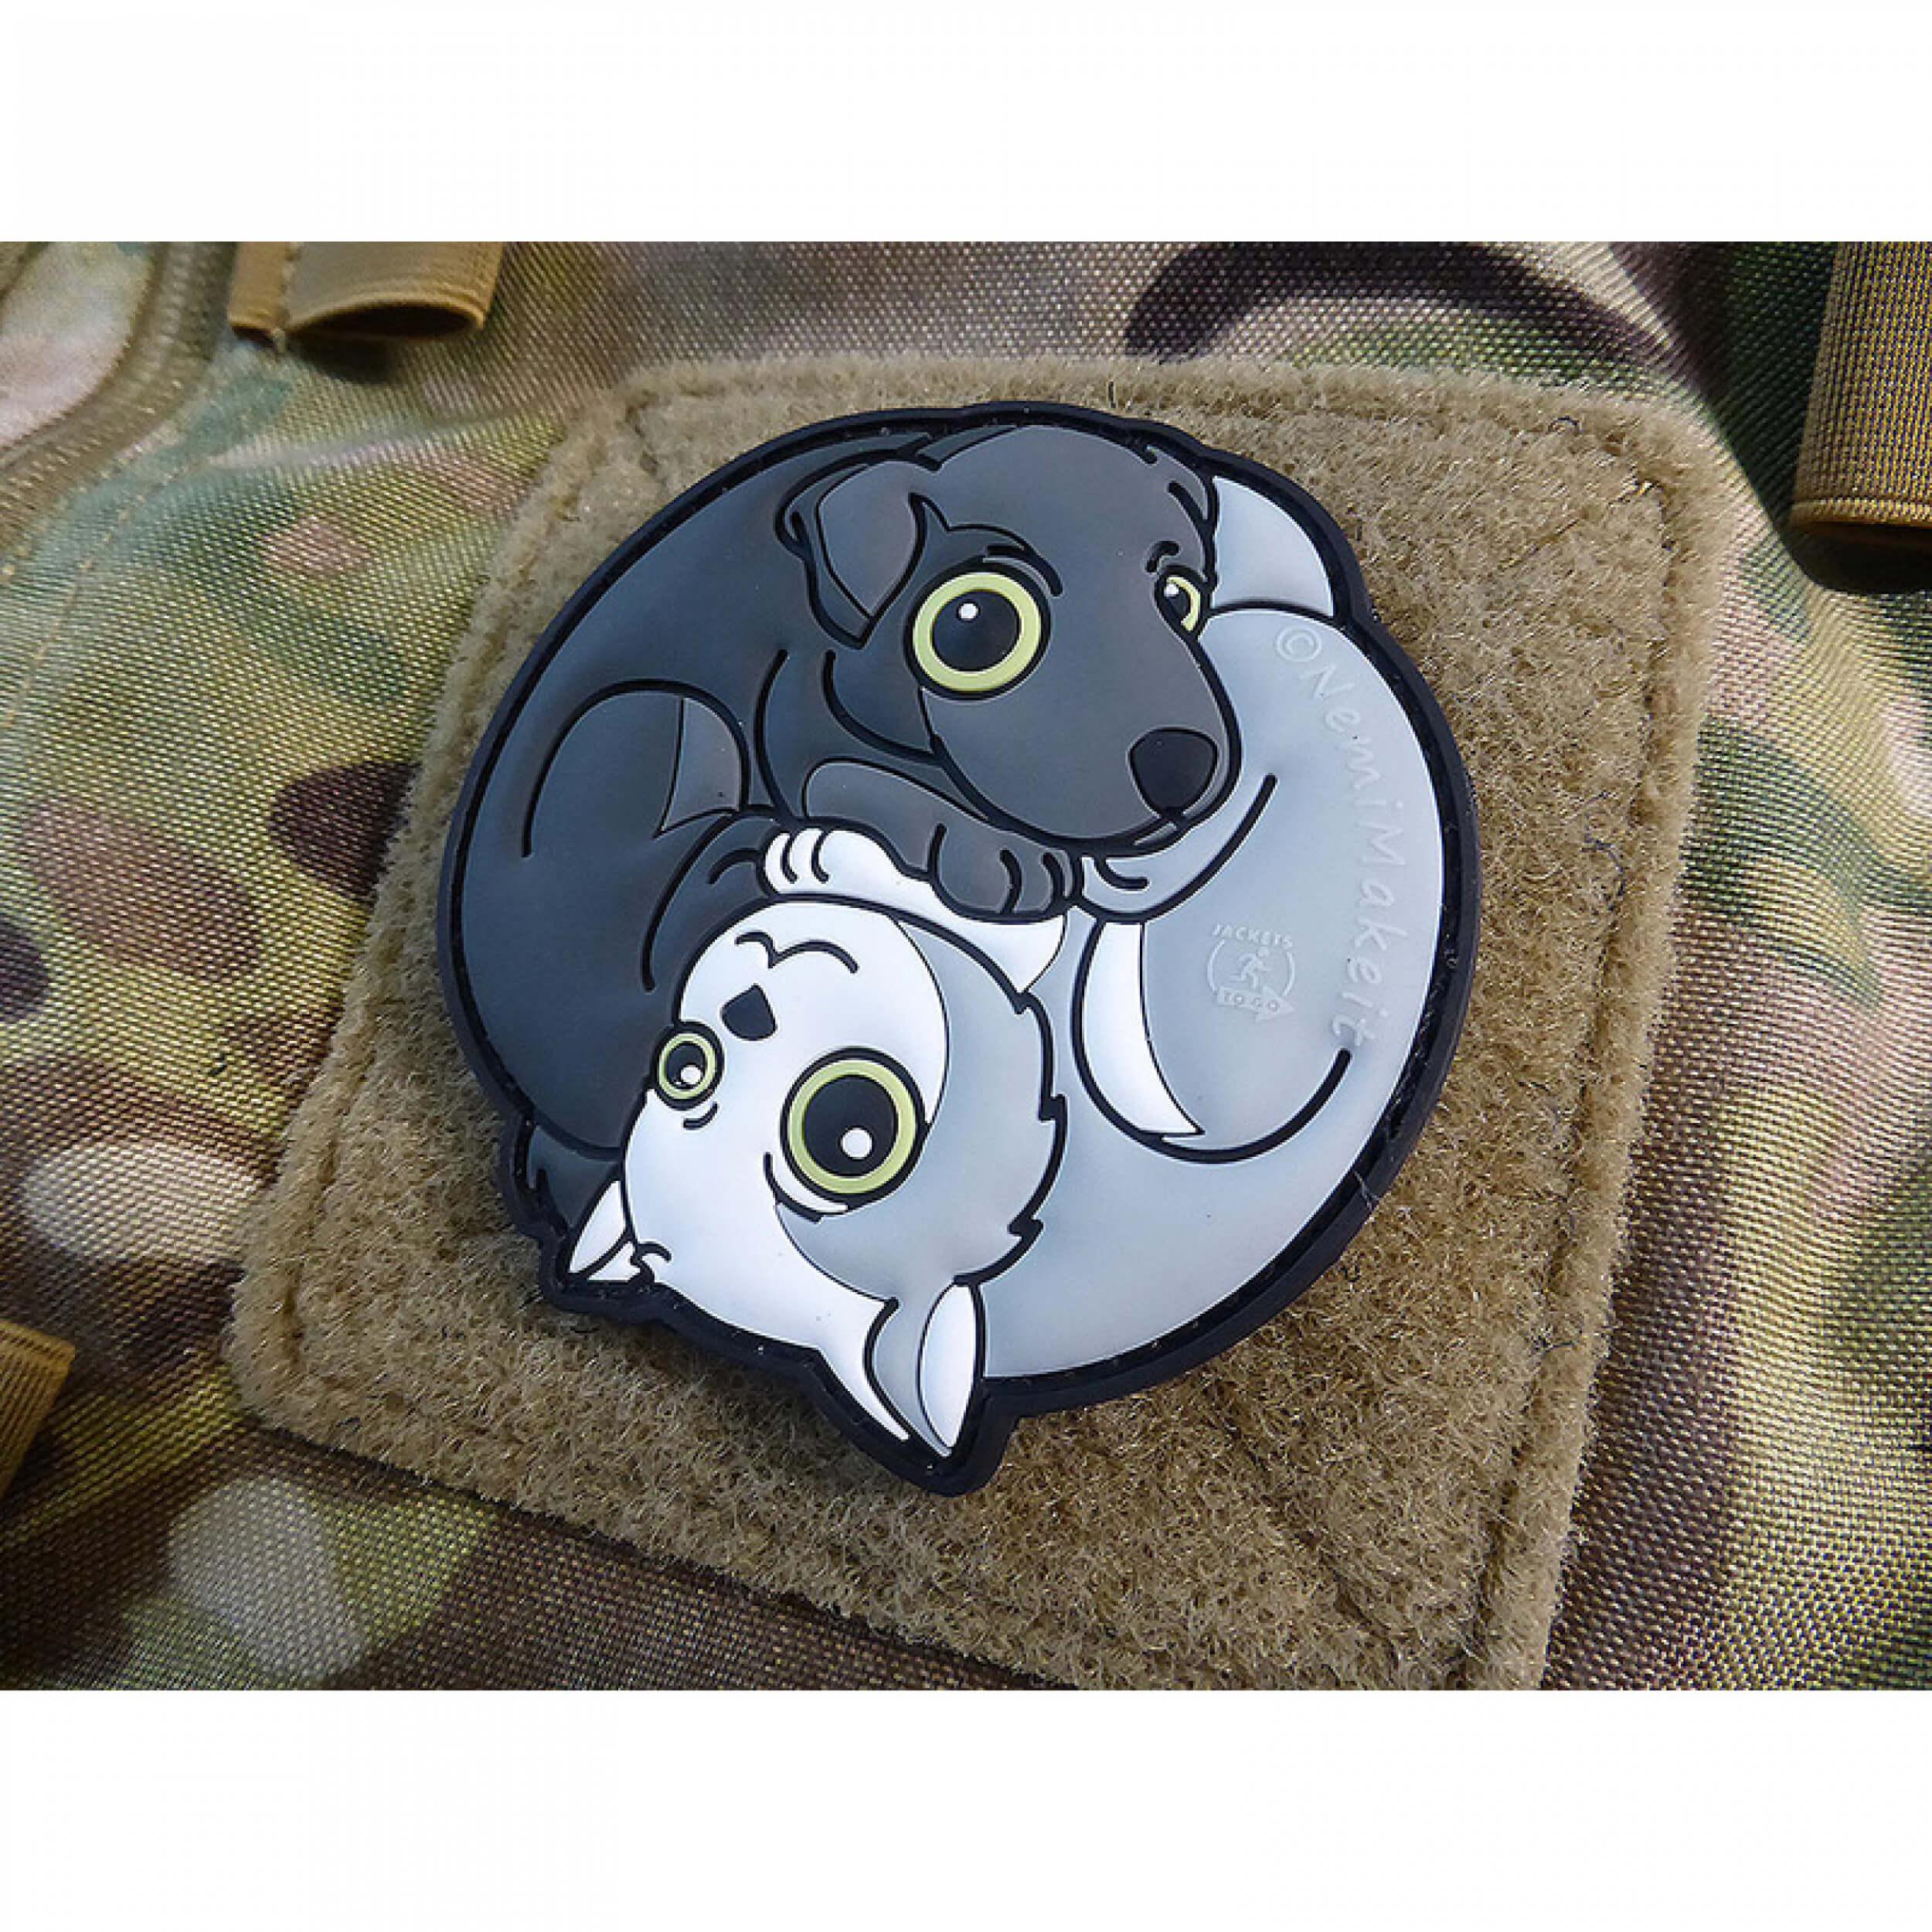 Black Dog - White Cat Yin & Yan 3D Rubber Patch, fullcolor